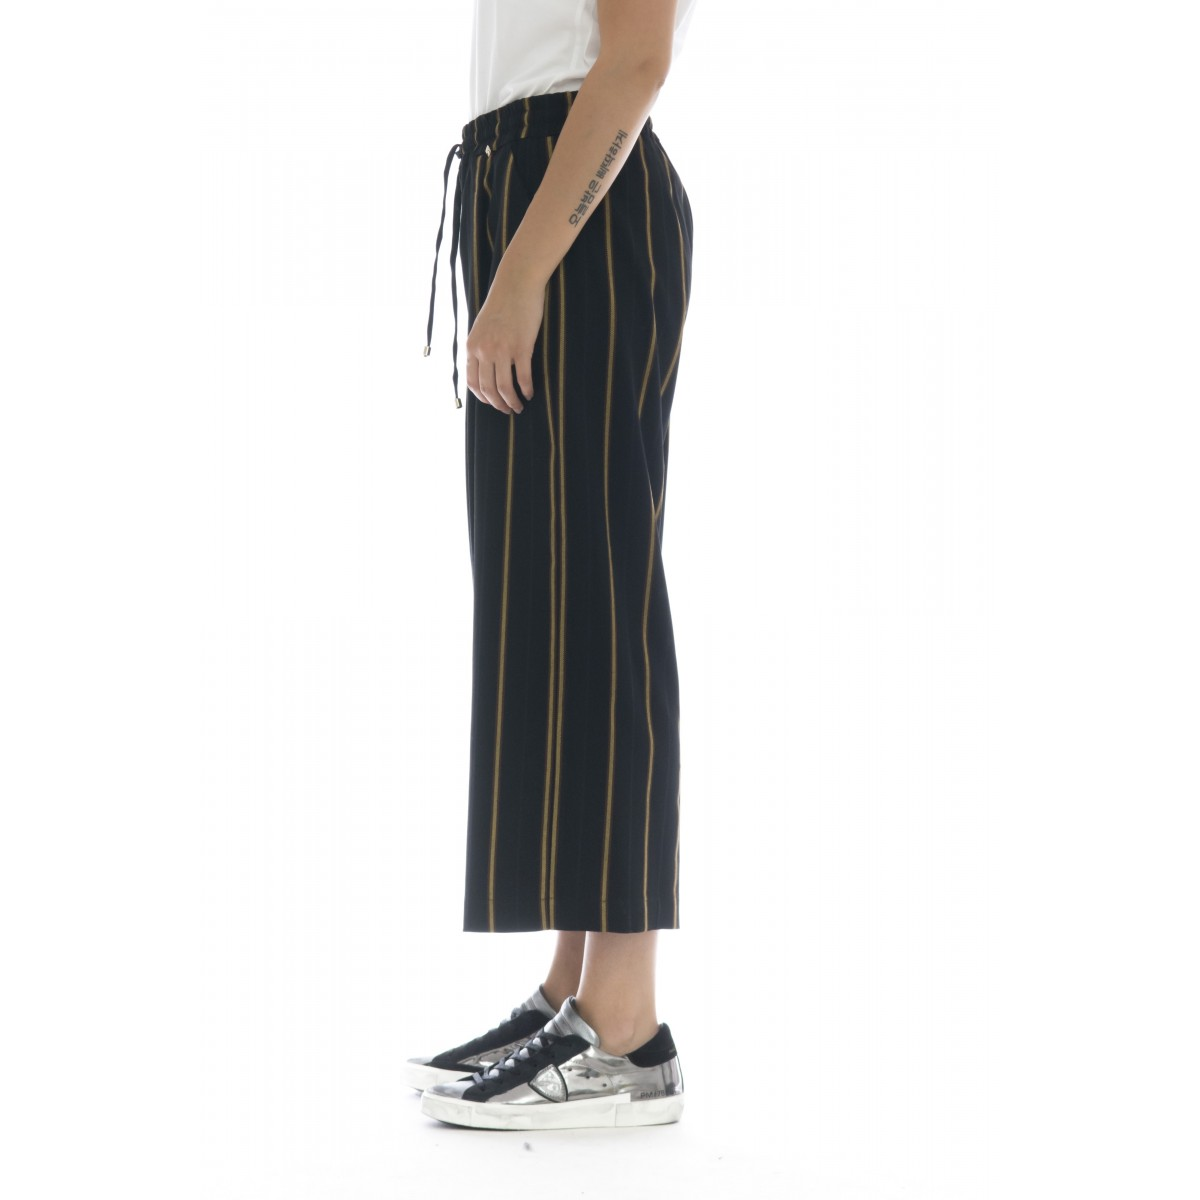 Pantalone donna - Giji pantalone rigato largo